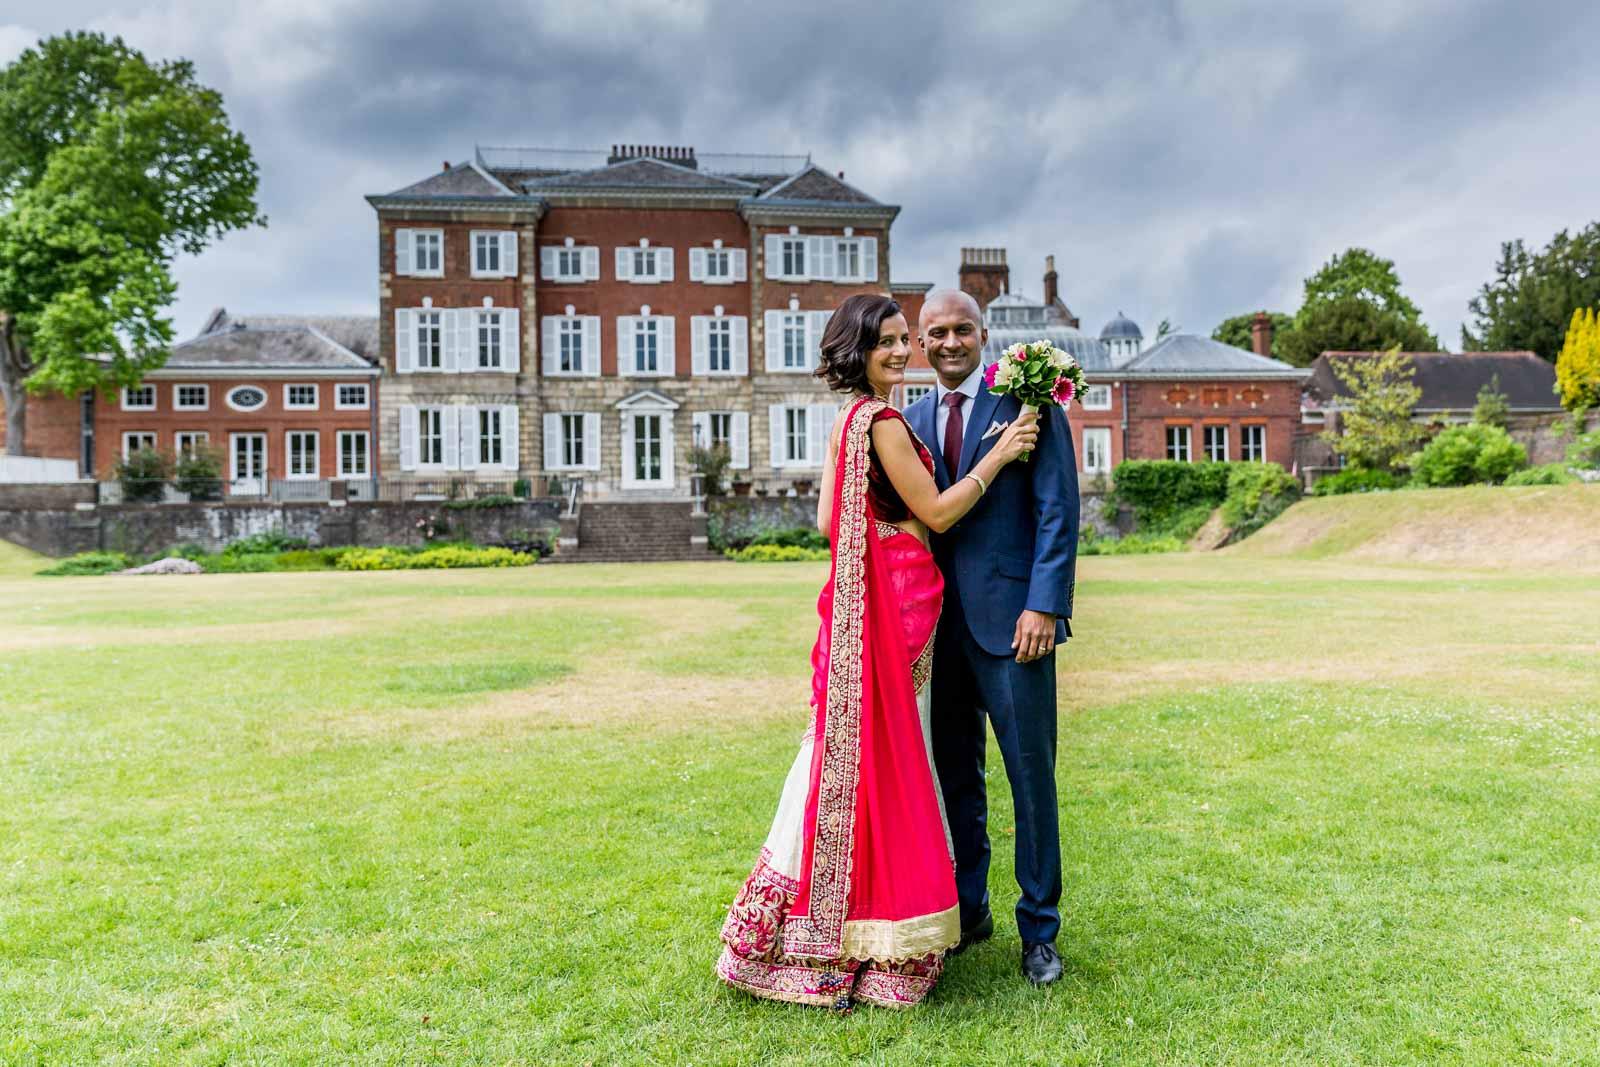 Bride & groom at York House, Twickenham